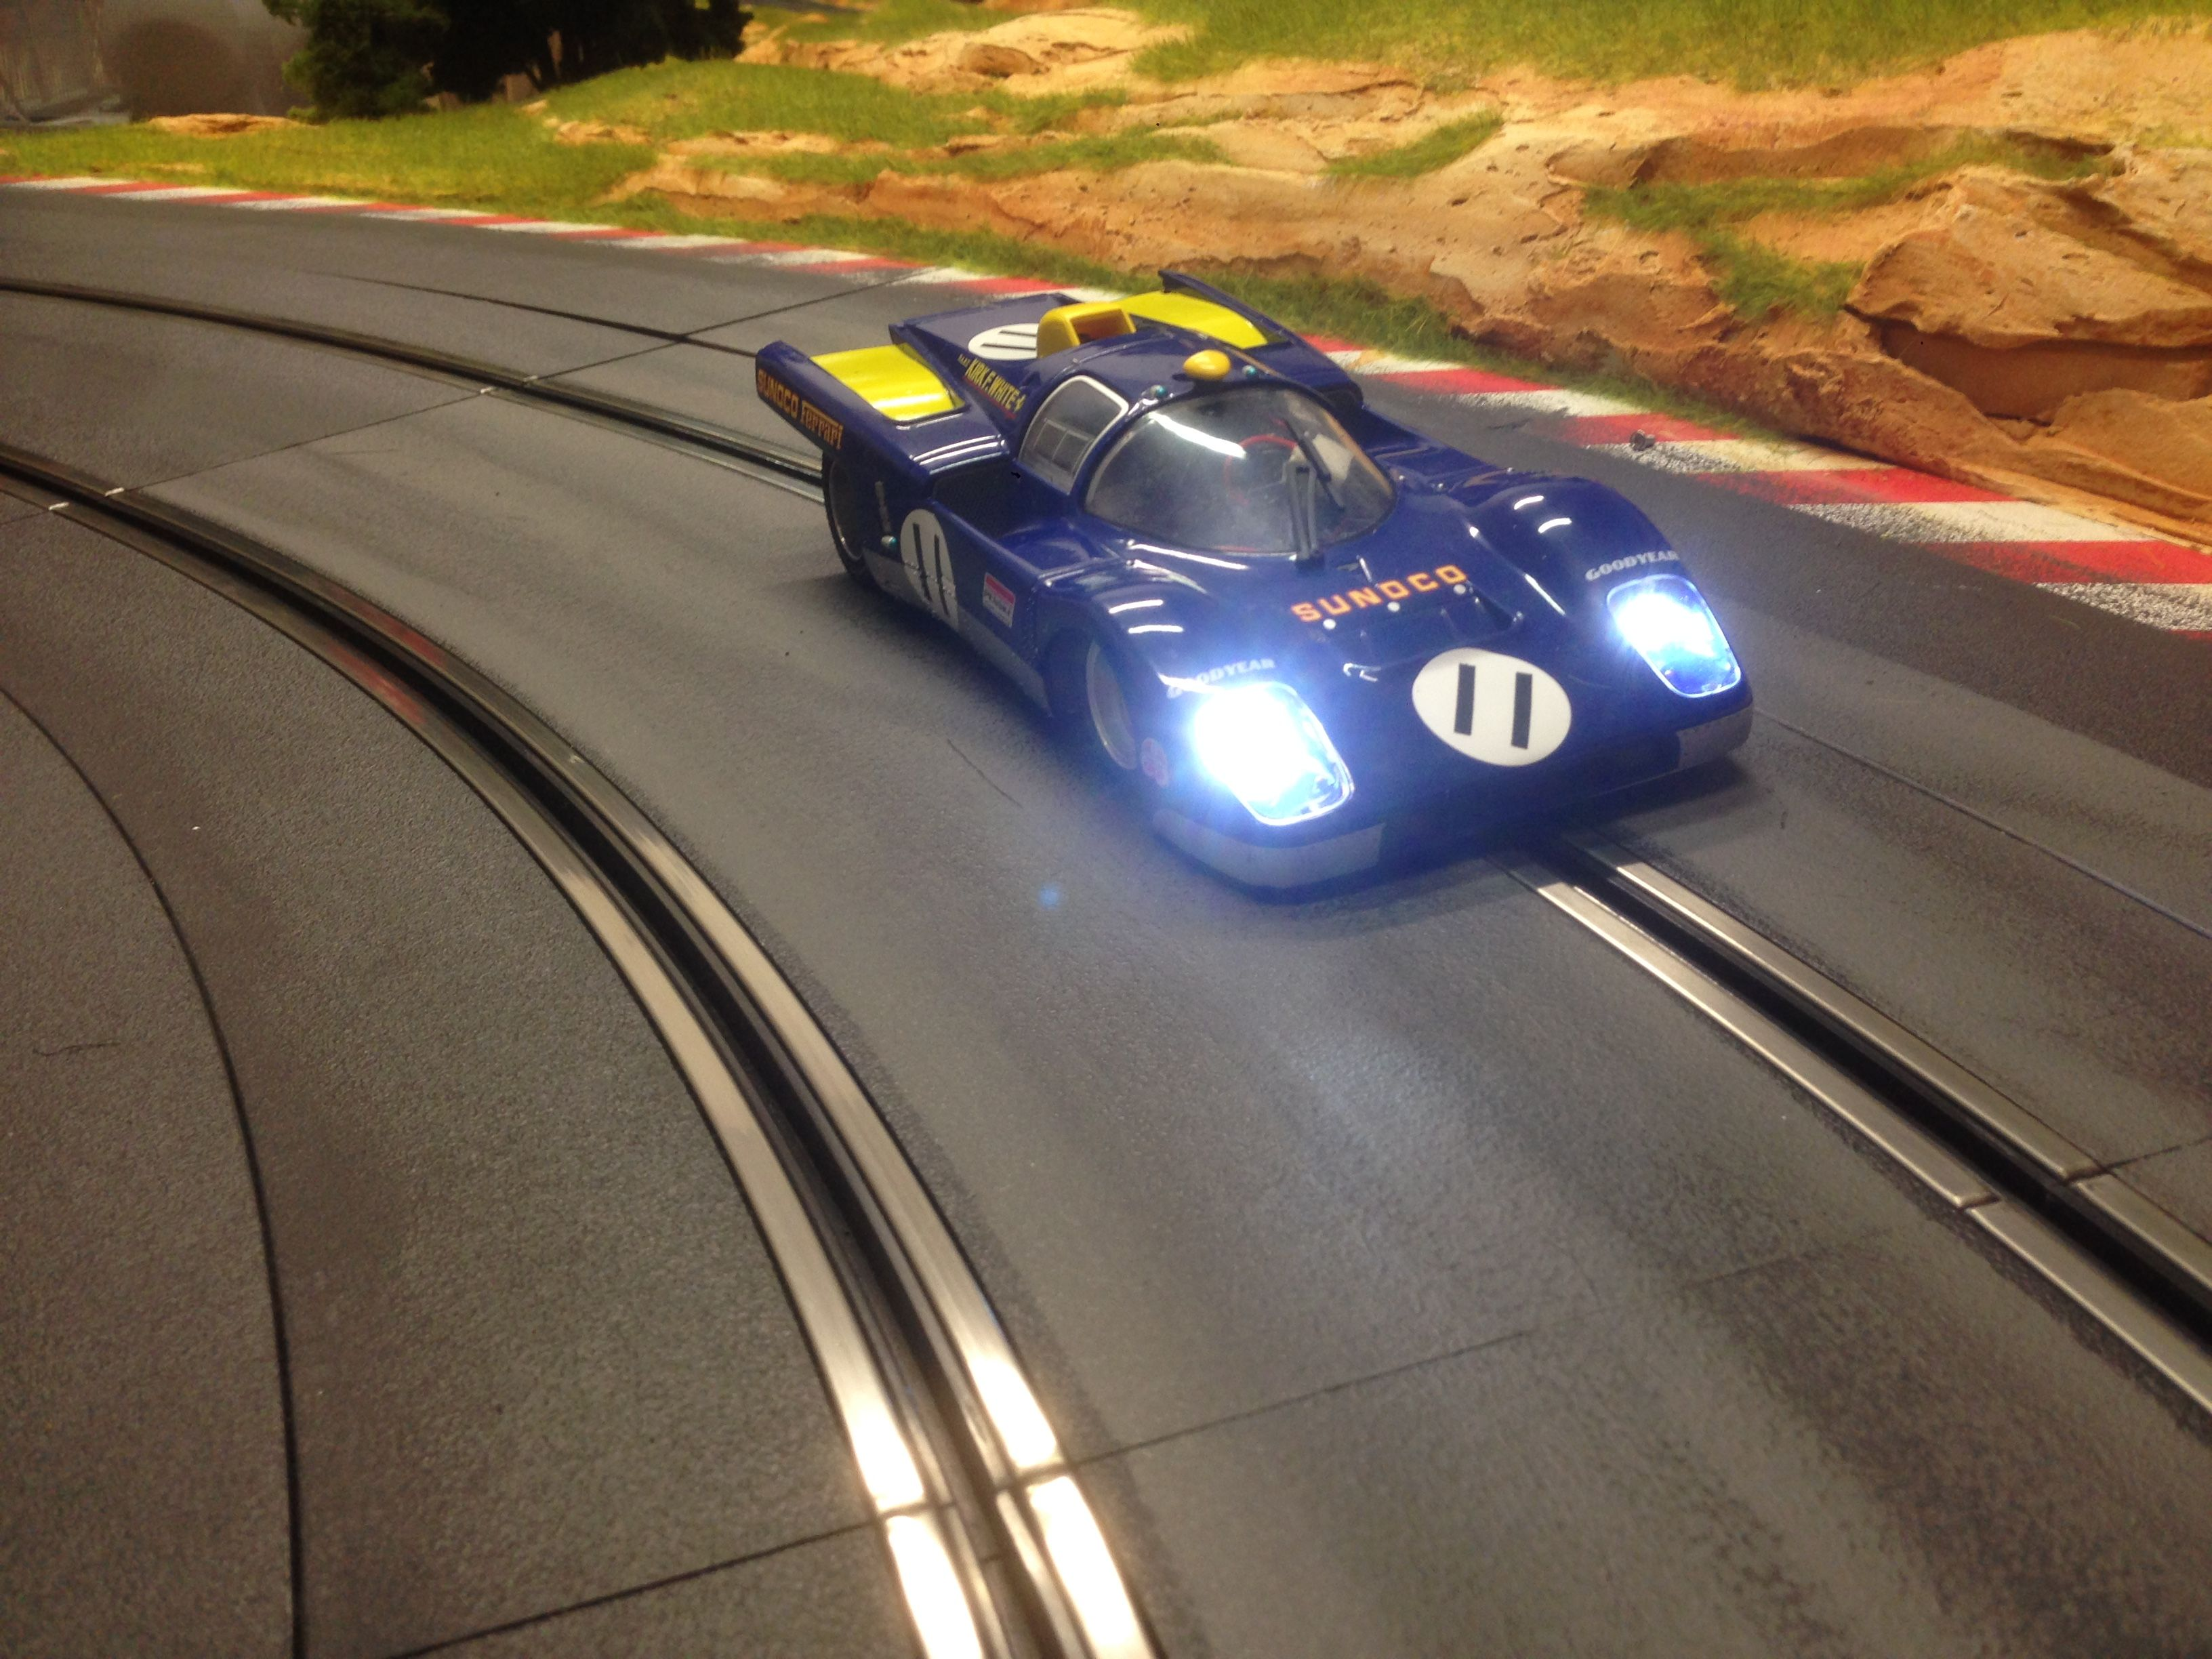 MOLETTARING SLOT TRACK FERRARI 512M SUNOCO / BRM MODEL CARS Team Penske at Le Mans